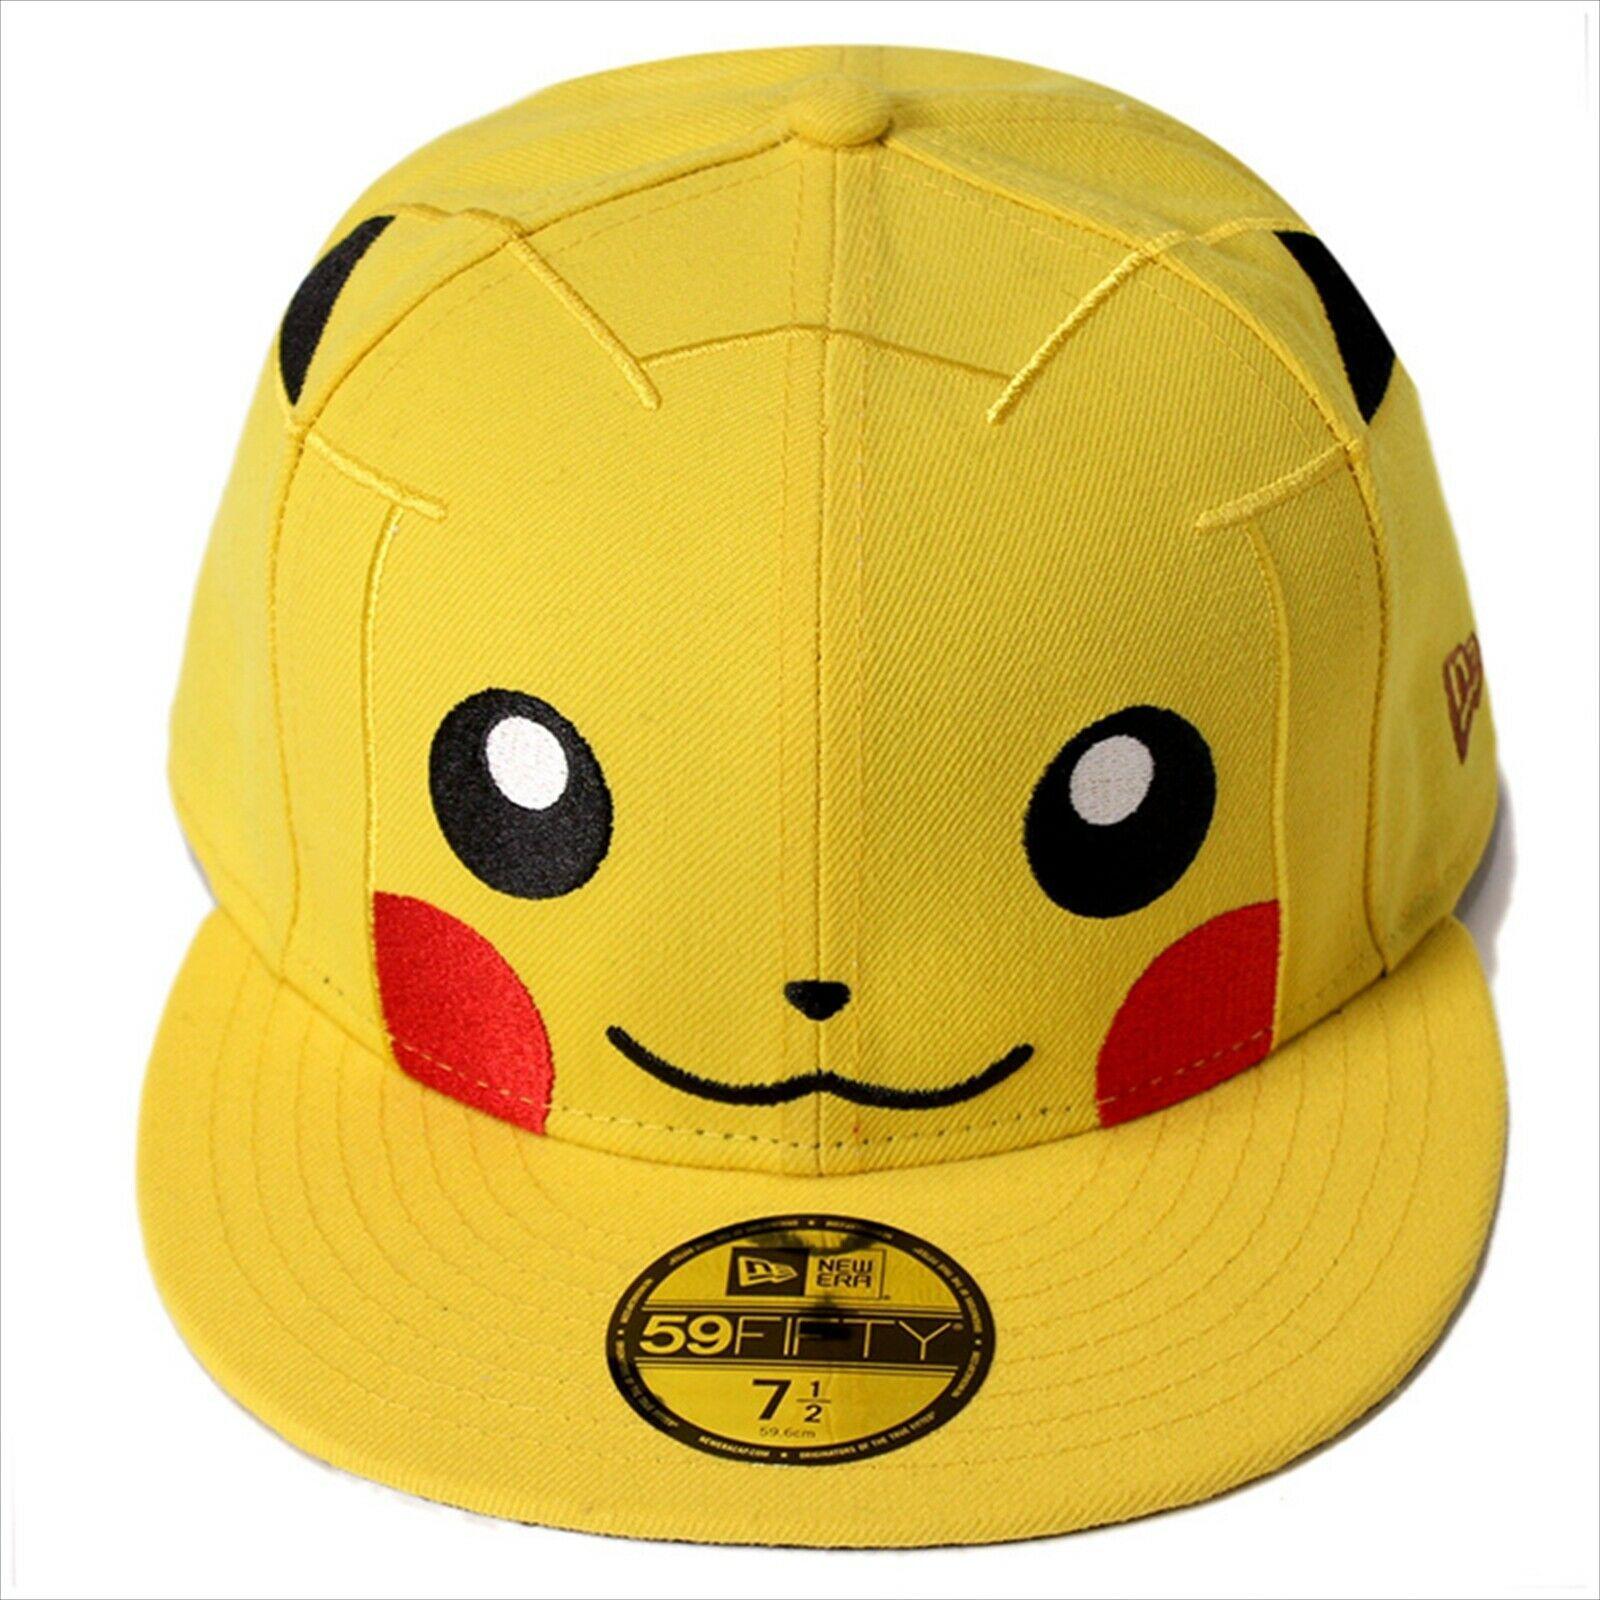 New Era Pokemon collaboration cap 59FITY Pikachu Cyber Yellow